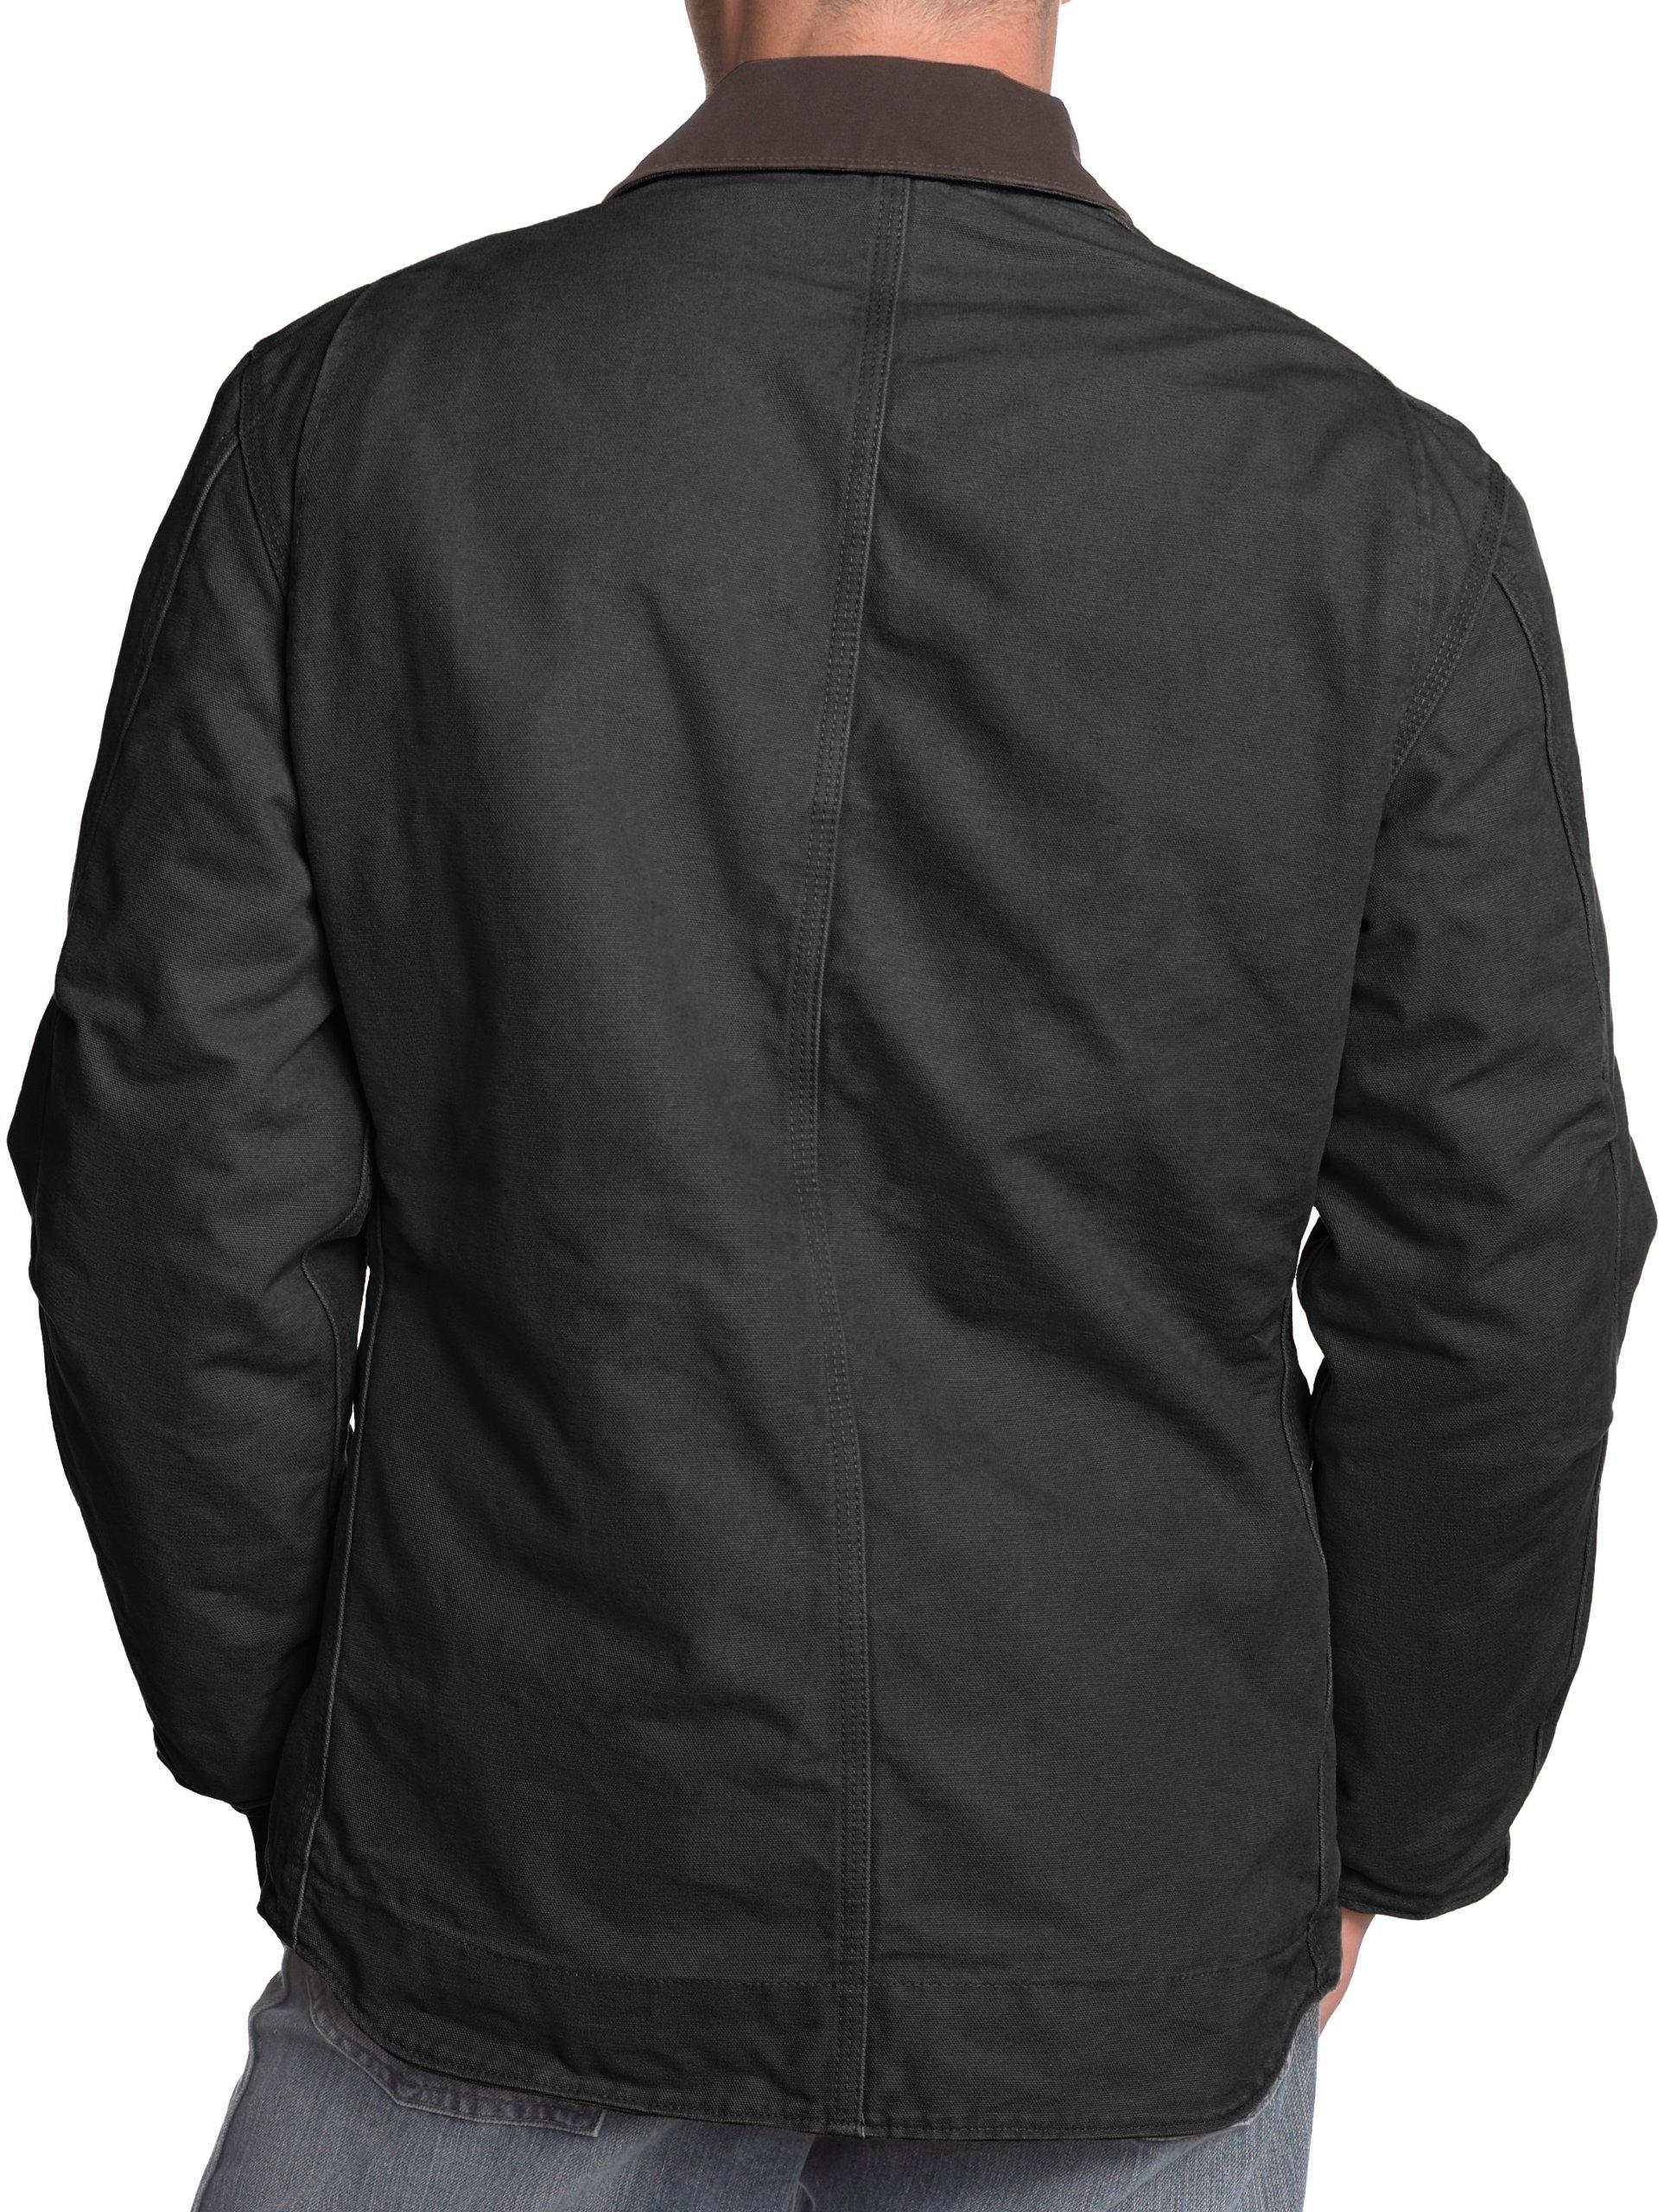 Carhartt Men's Ridge Coat Sherpa Lined Sandstone,Black,X-Large by Carhartt (Image #2)